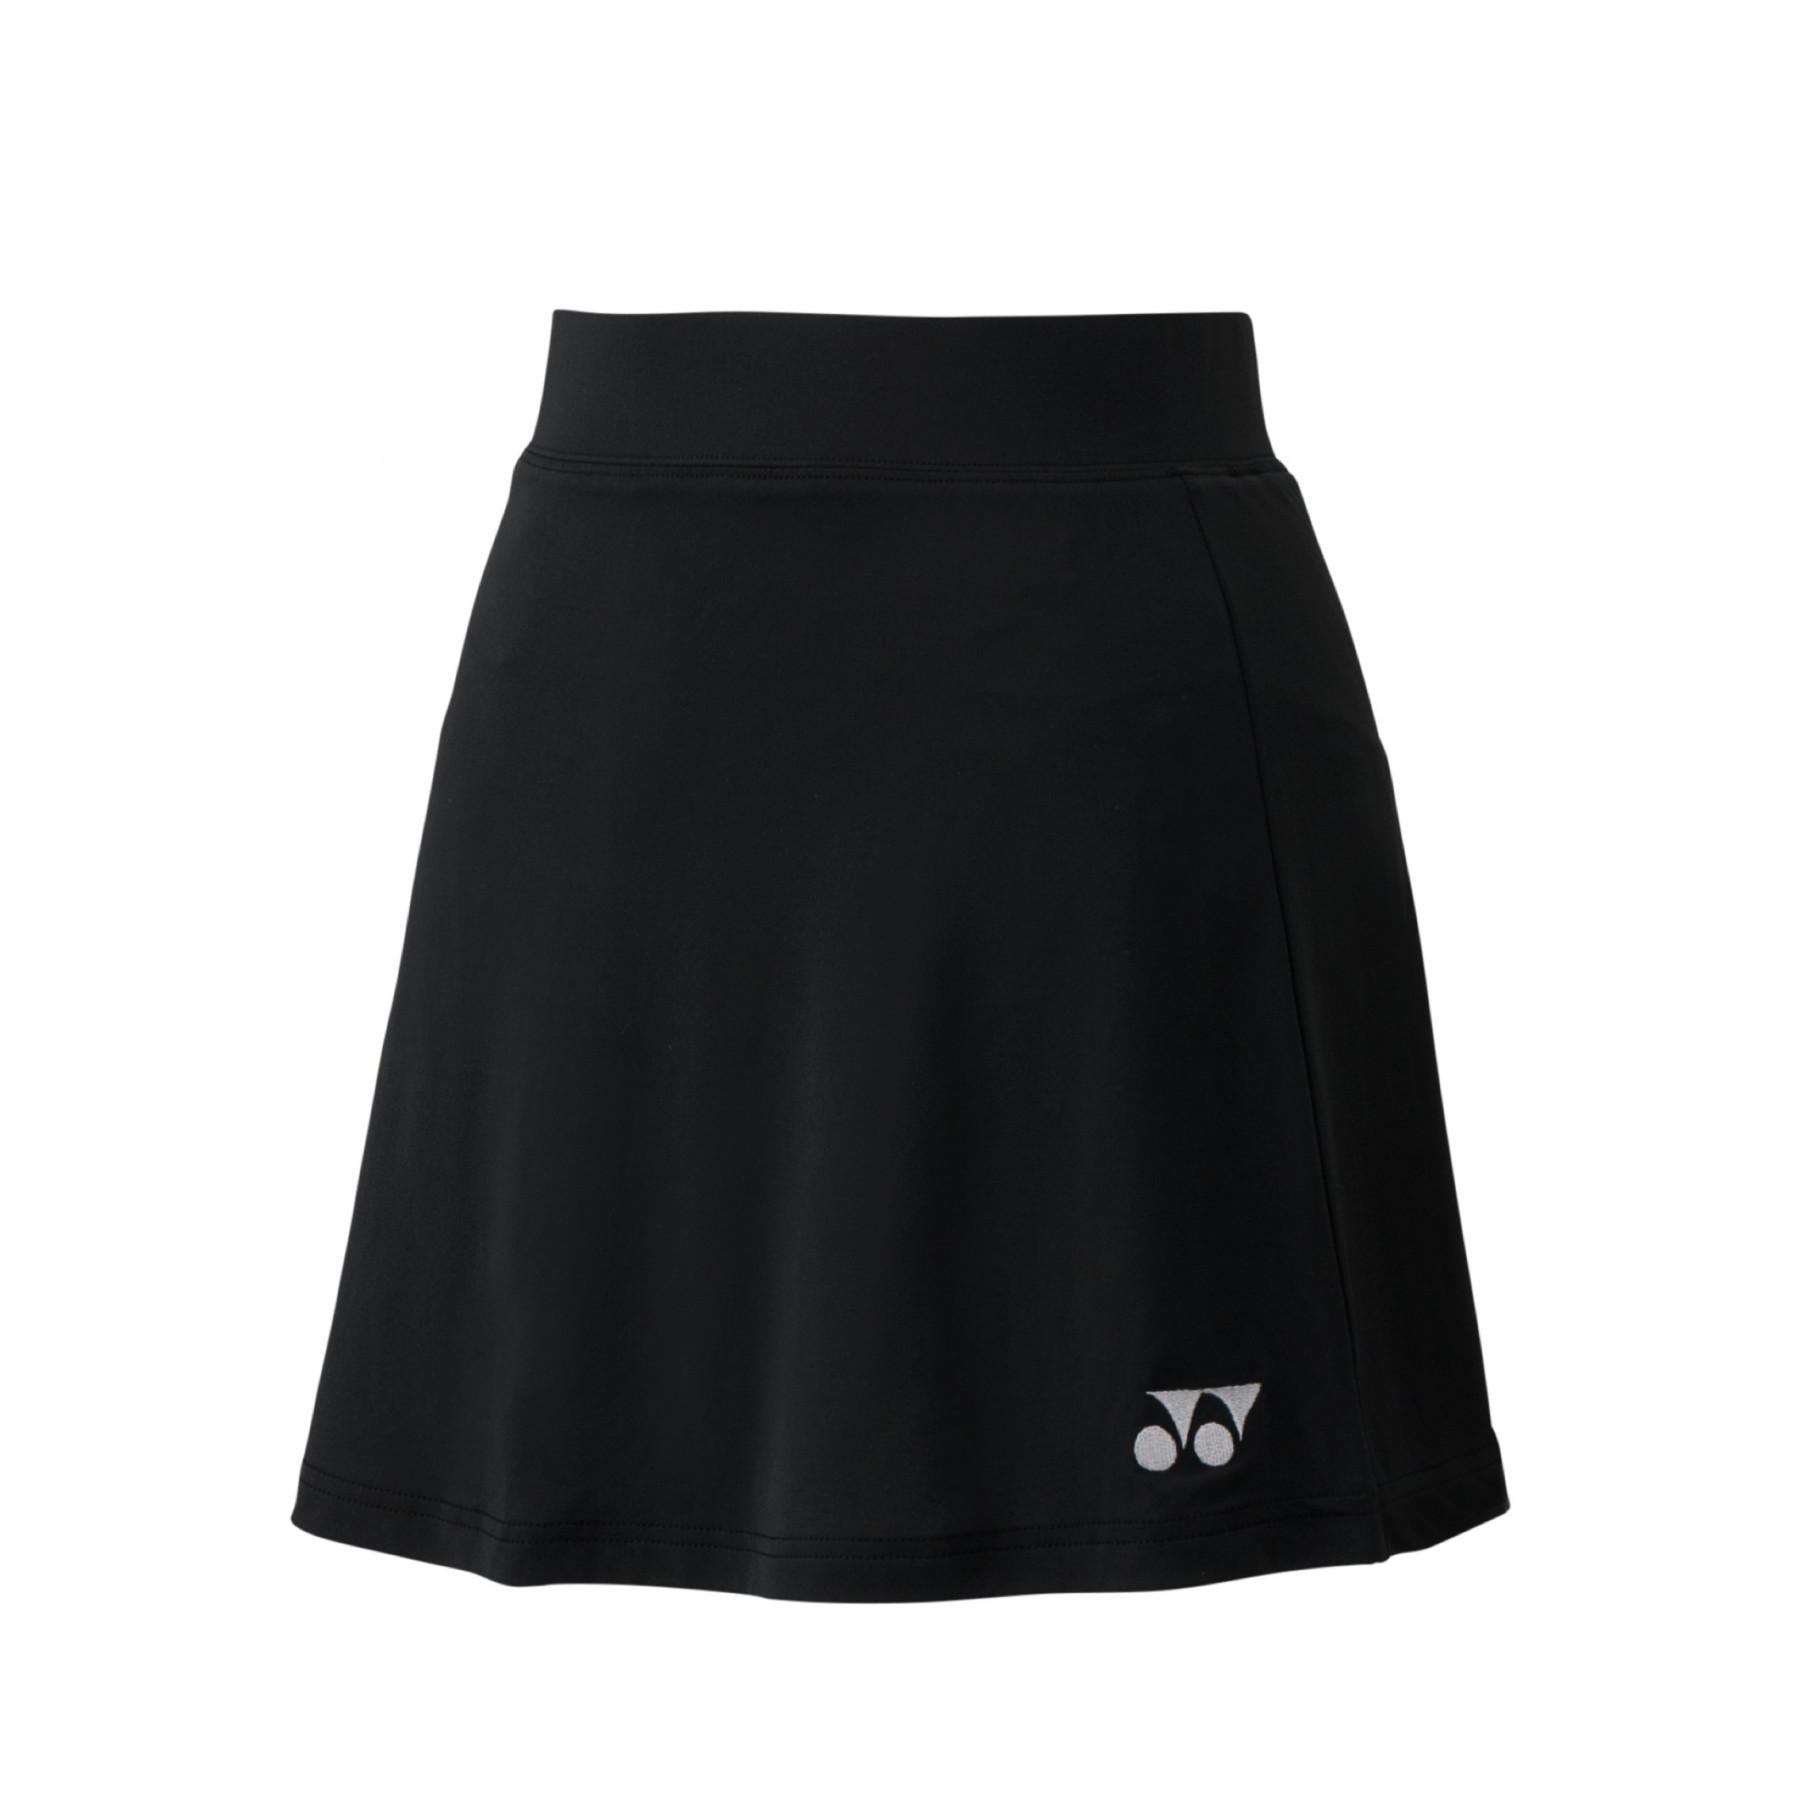 Yonex team skirt 26039